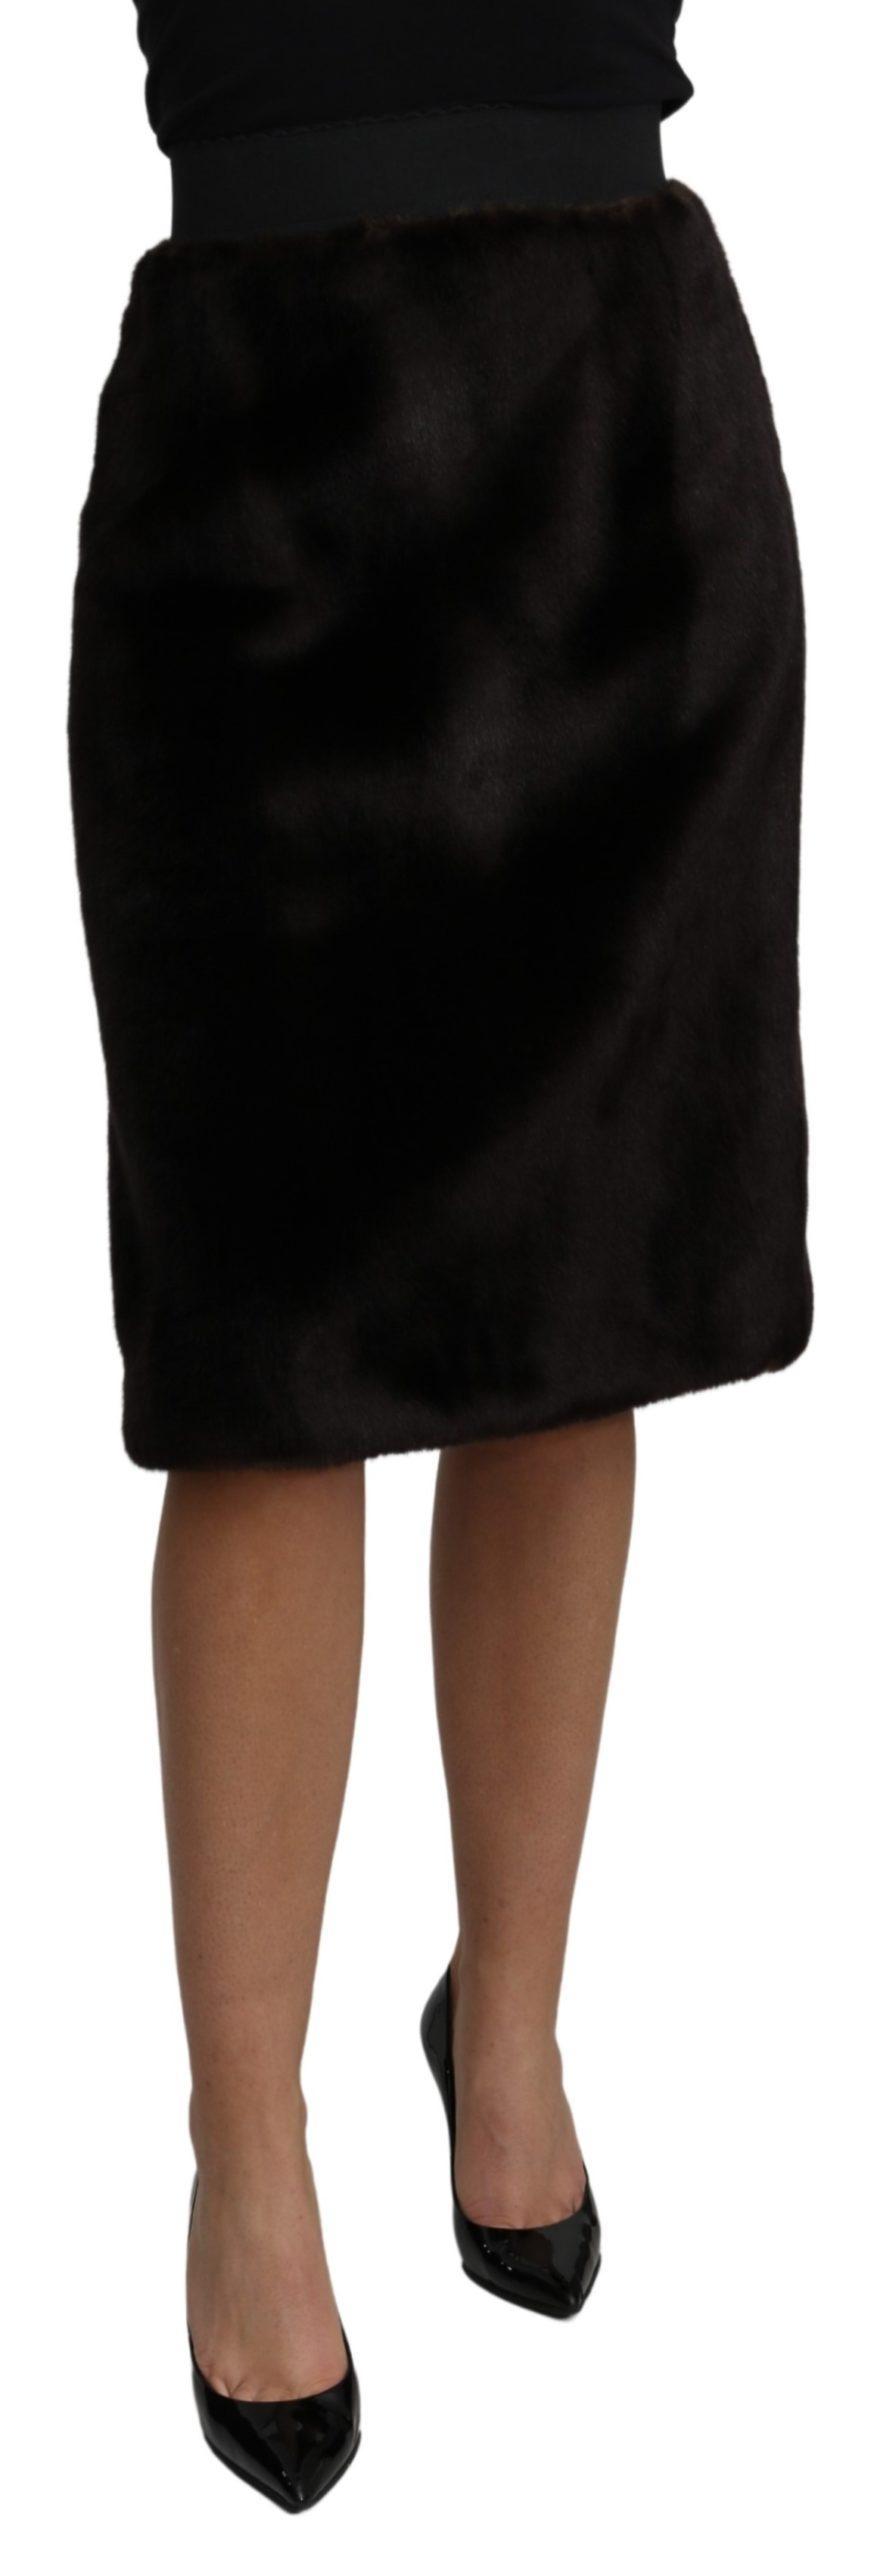 Dolce & Gabbana Women's High Waist Pencil Cut Knee Length Skirt Black SKI1473 - IT40|S